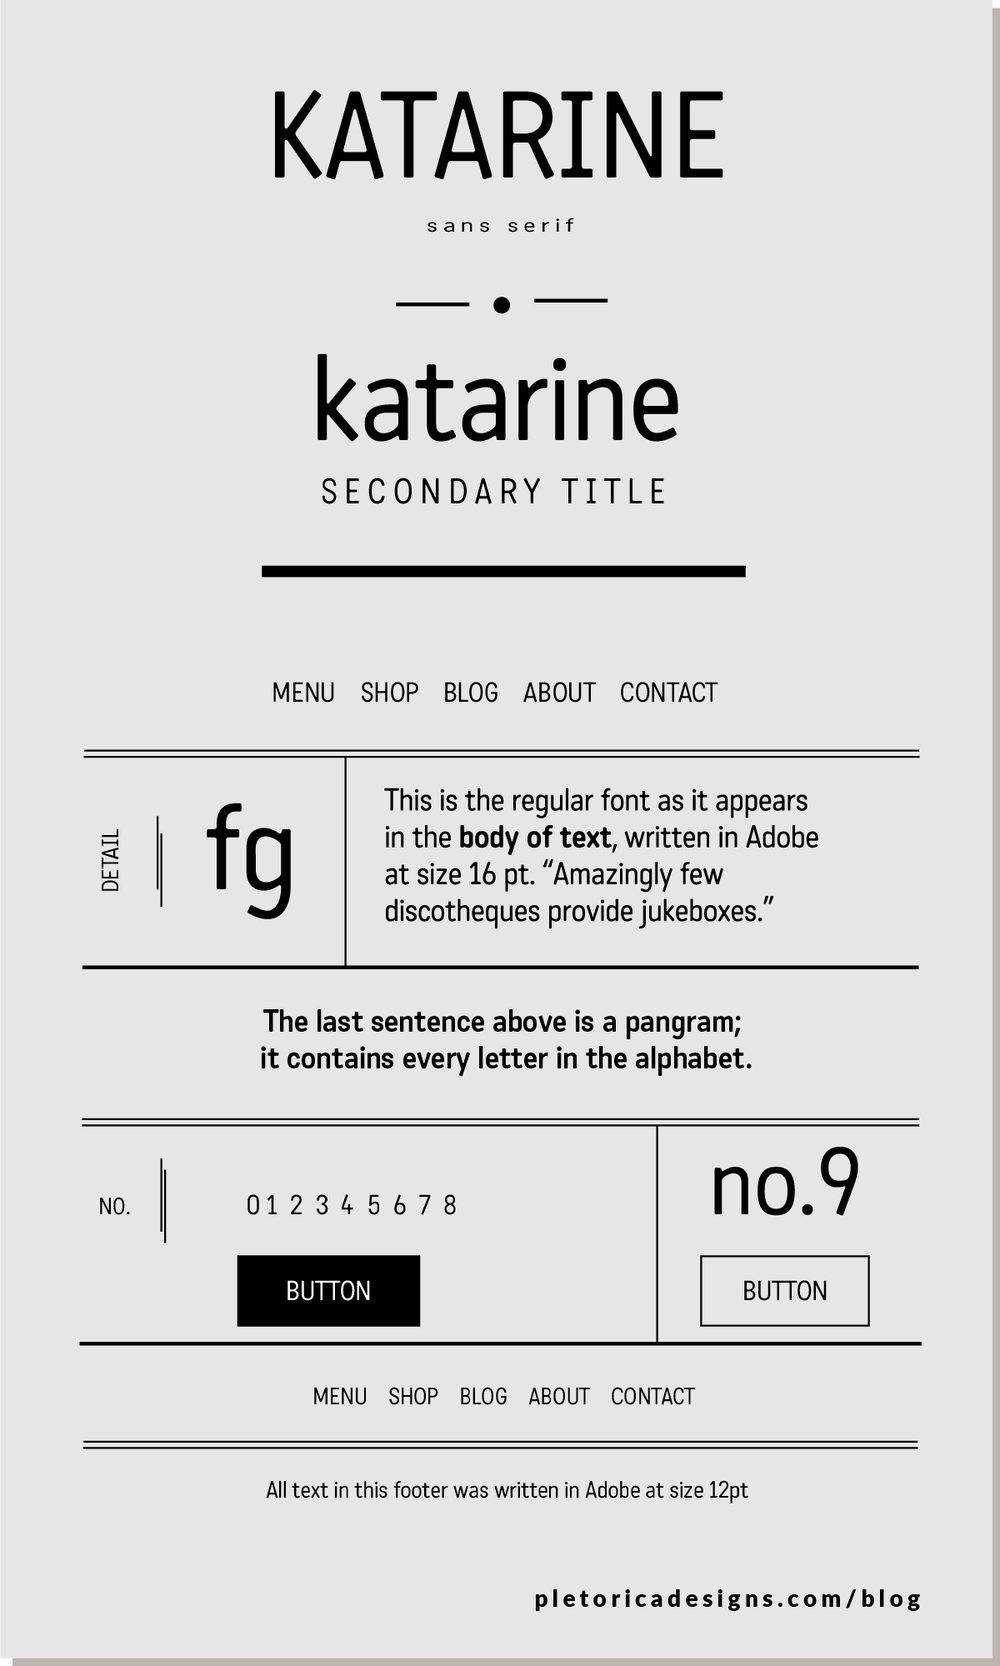 LET'S TYPE: Katarine — PLETÓRICA DESIGNS